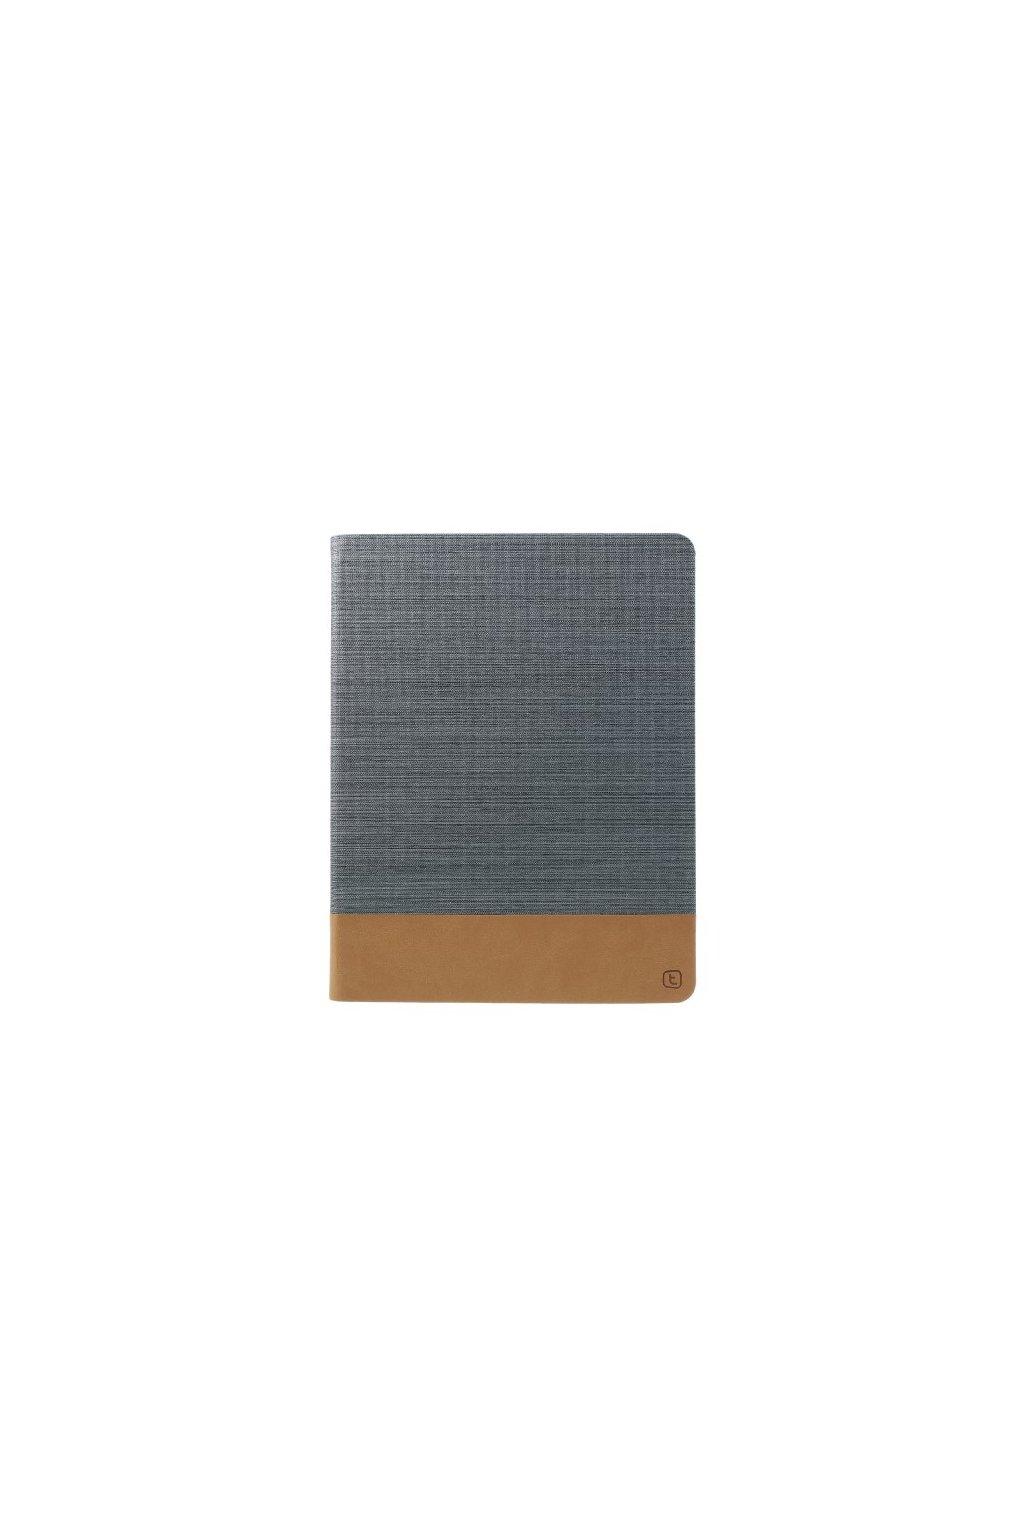 Pouzdro Torras Smart Apple iPad 2/3/4, black